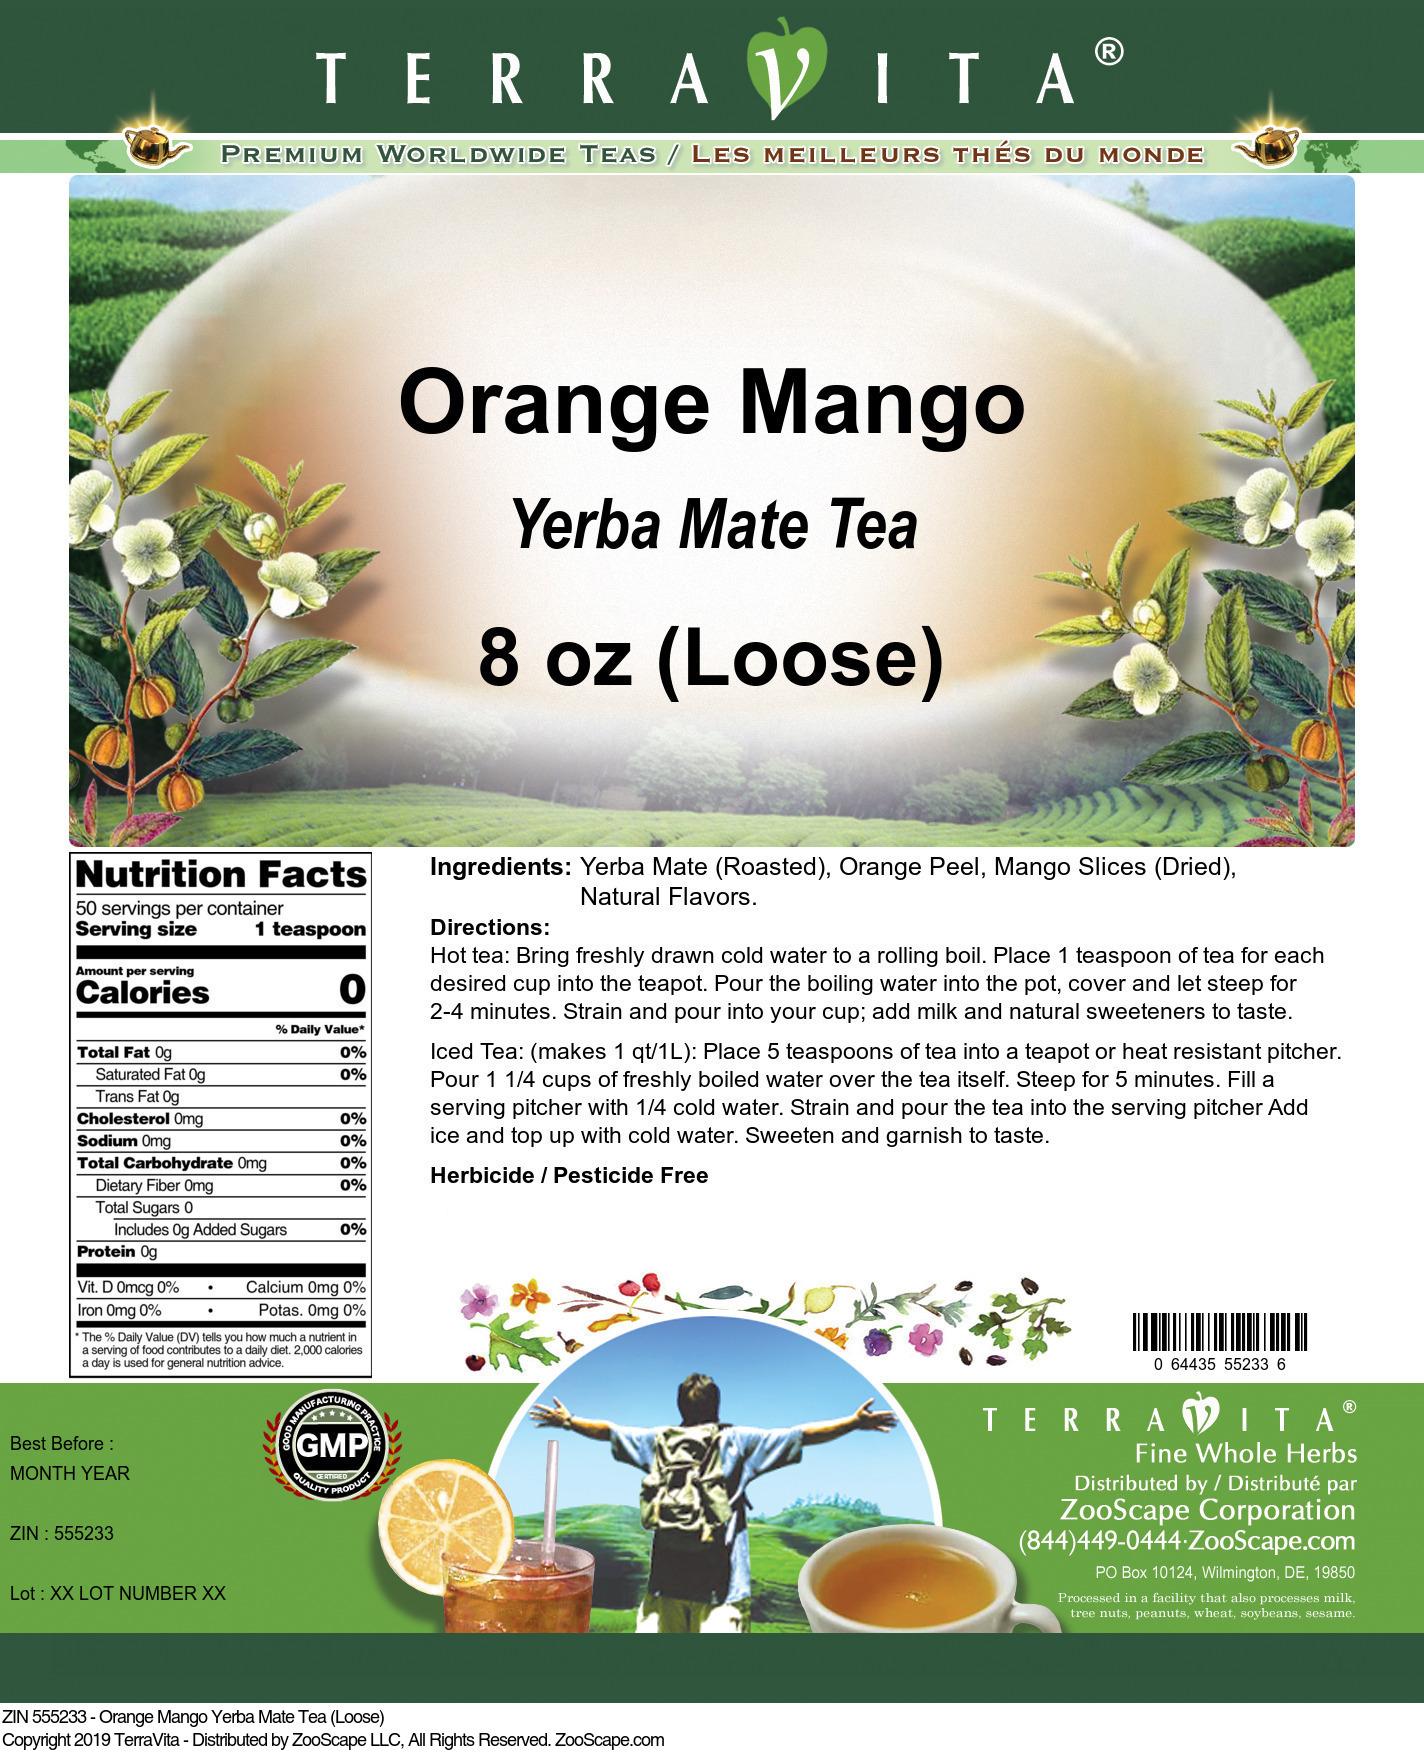 Orange Mango Yerba Mate Tea (Loose)